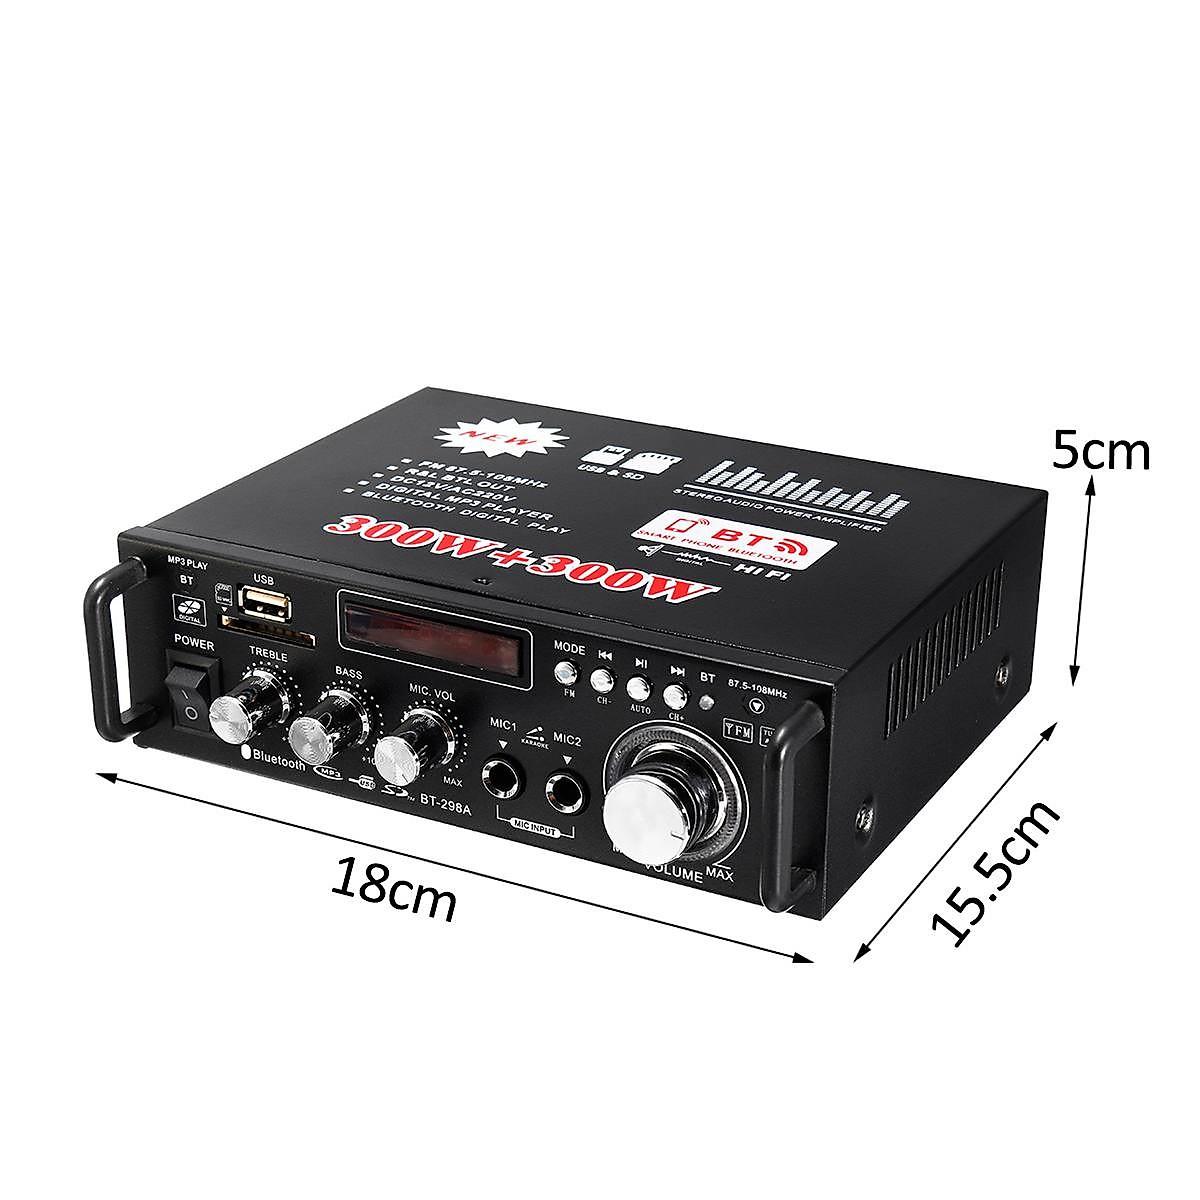 Ampli Mini Karaoke Bluetooth Cao Cấp BT-298A